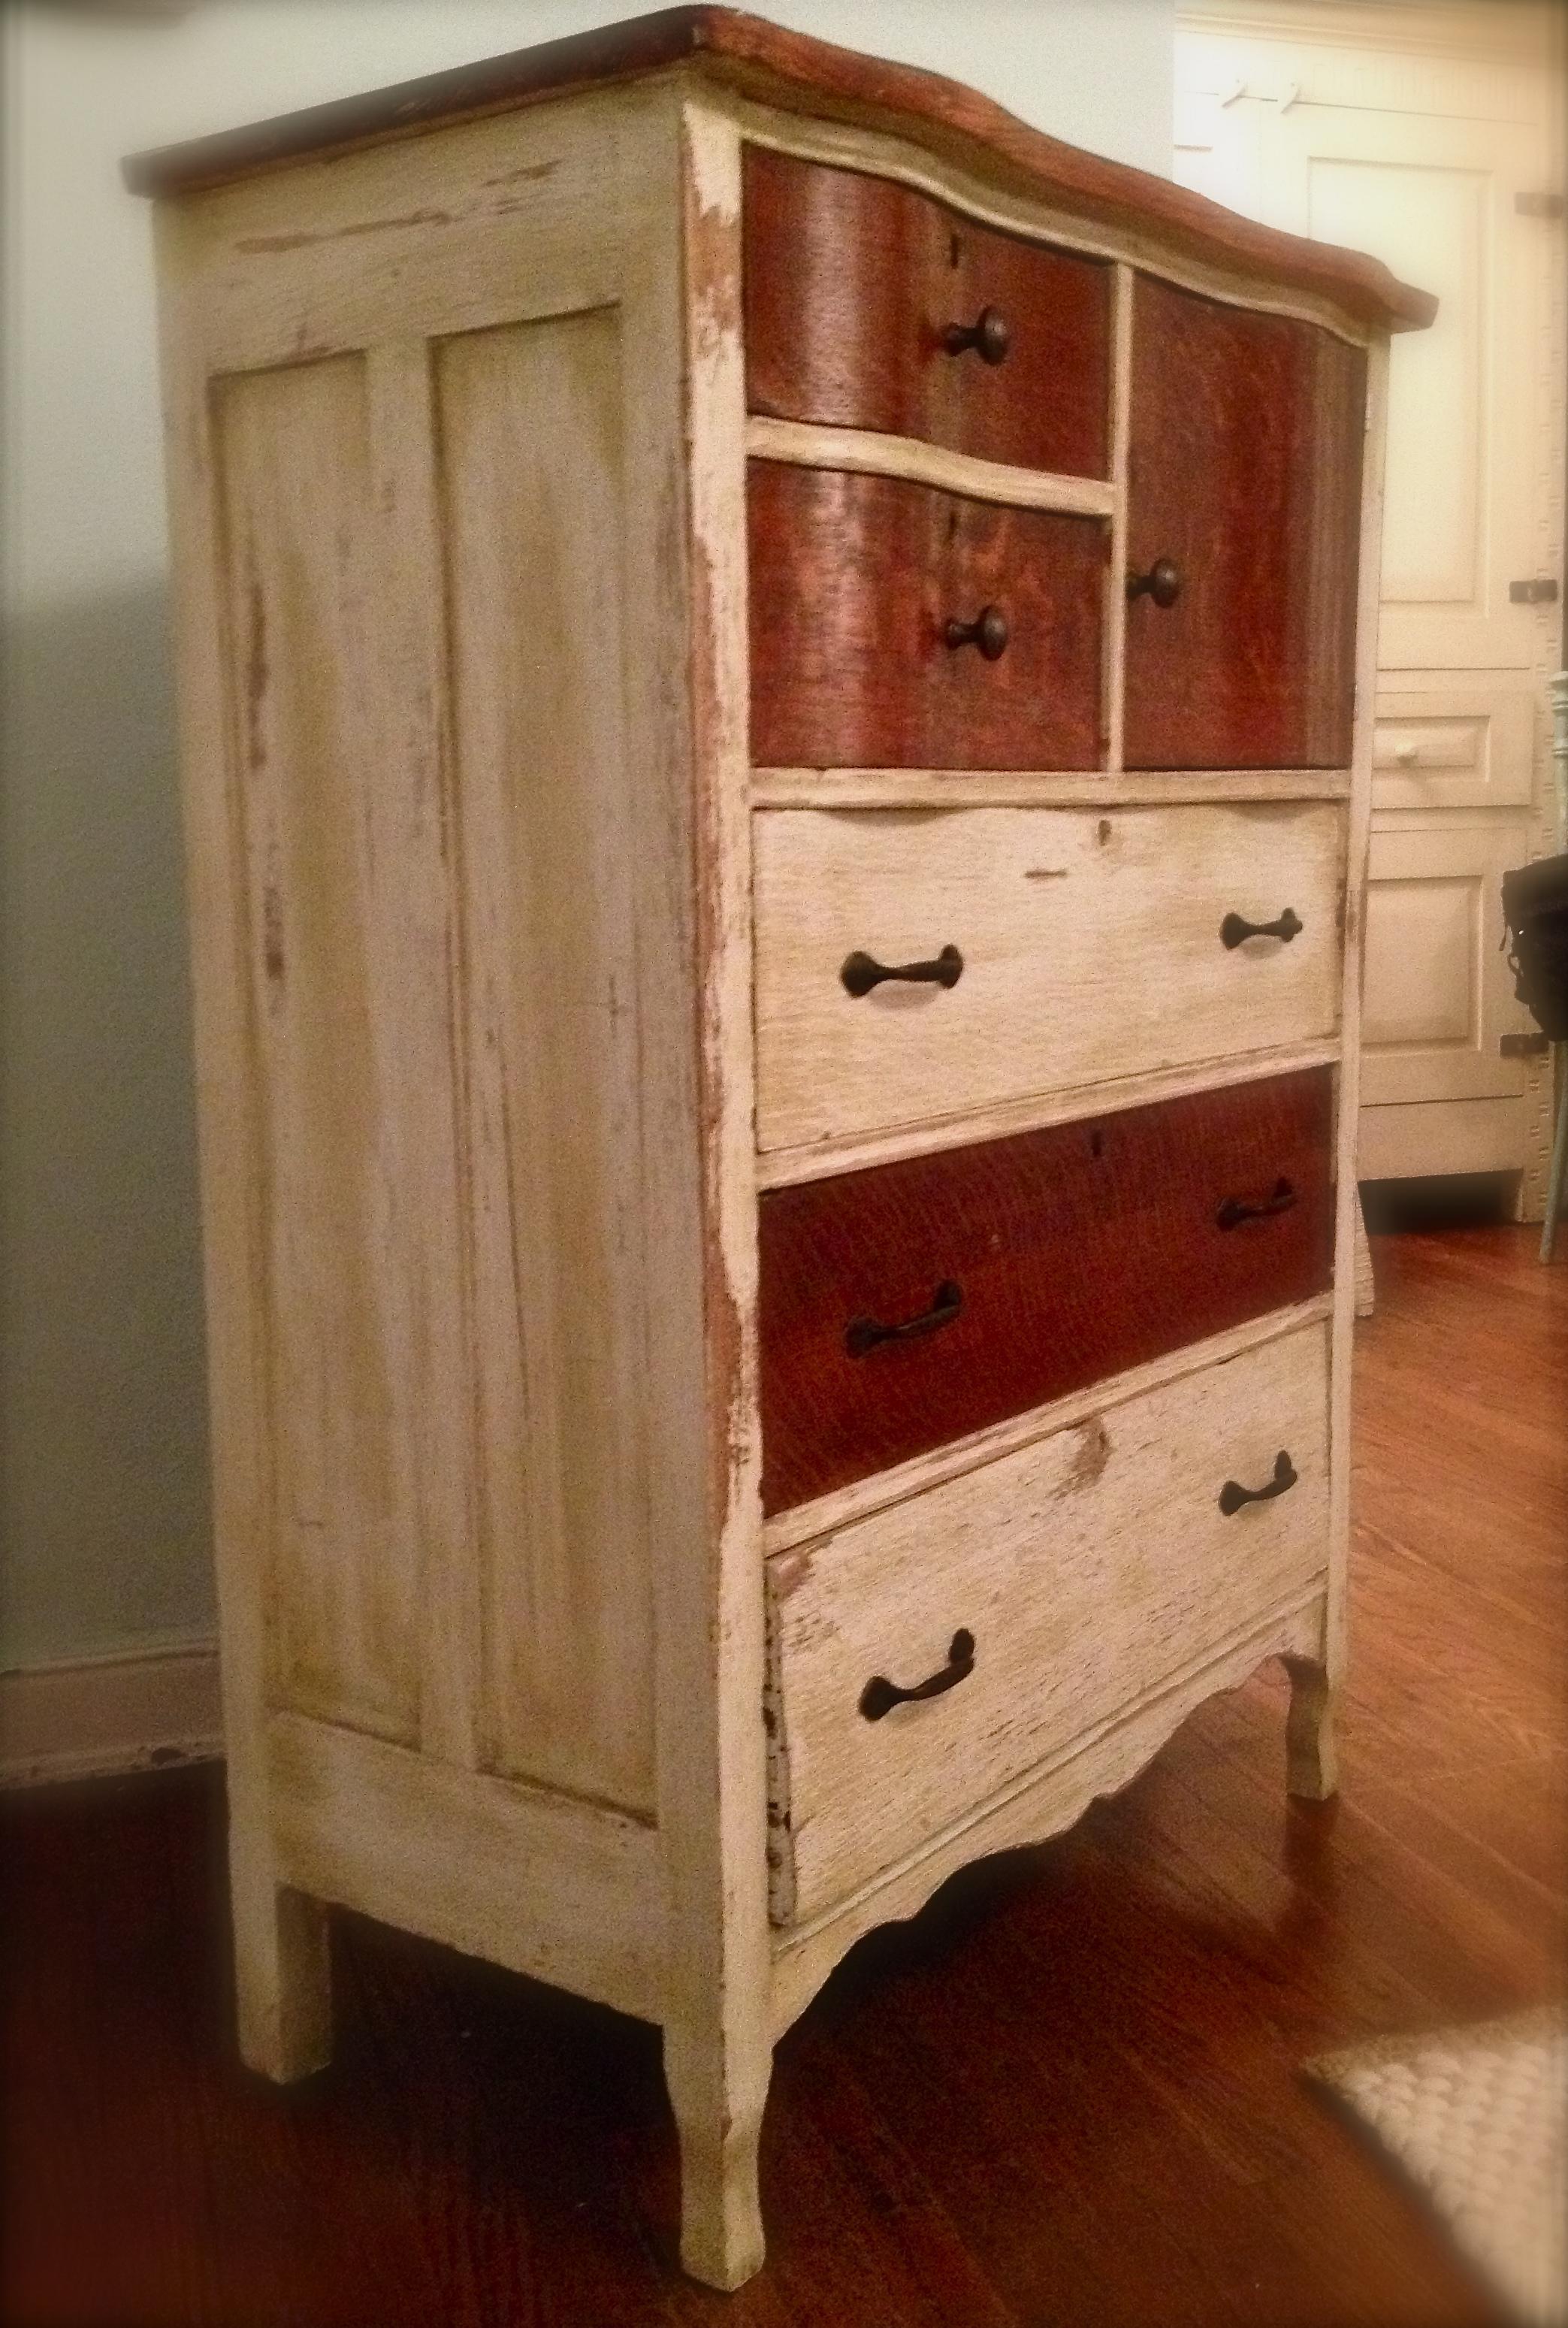 cheap 5 drawer dresser plans download laser wood carving fallacious01nmd. Black Bedroom Furniture Sets. Home Design Ideas